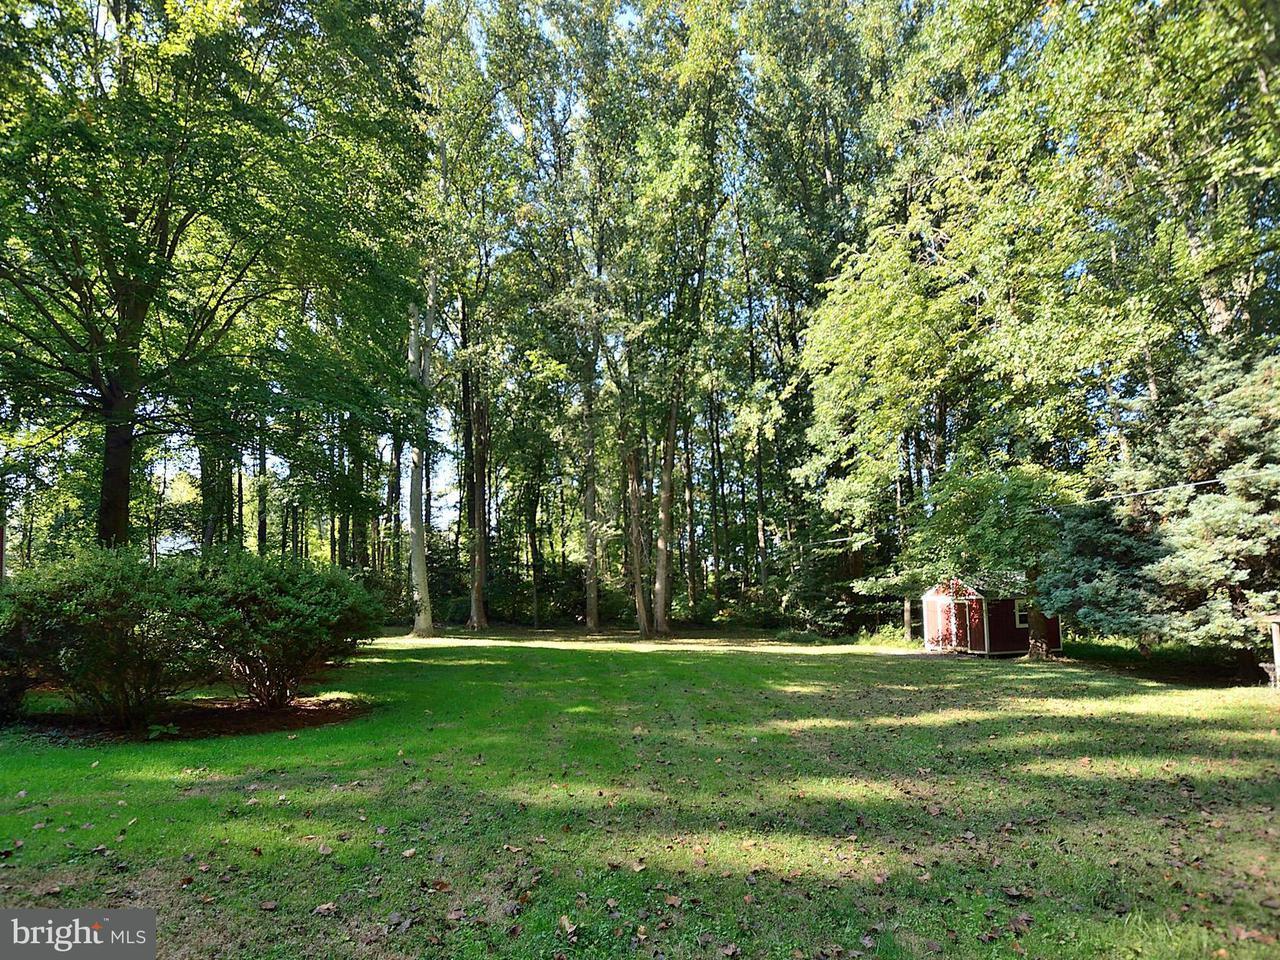 Land for Sale at 516 Haven Lane 516 Haven Lane Great Falls, Virginia 22066 United States